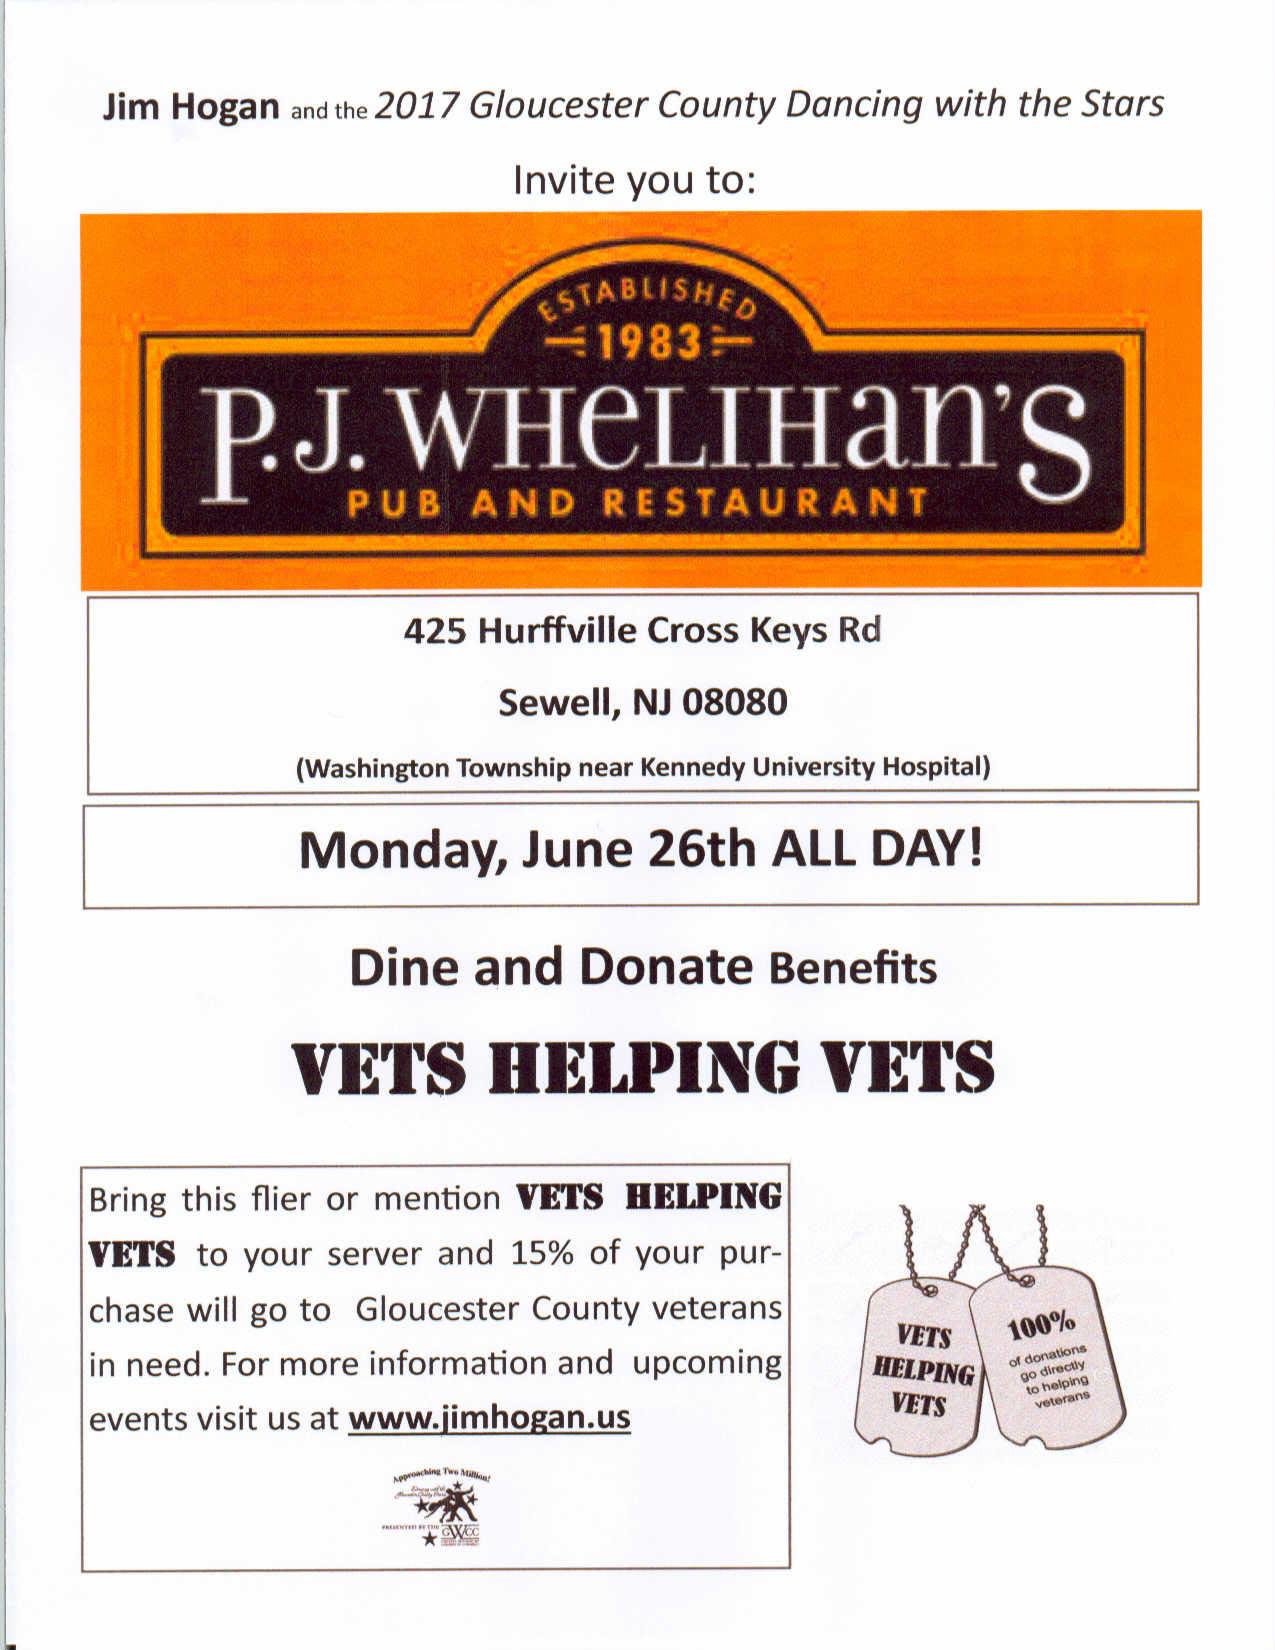 Vets Helping Vets - Dine & Donate - Jim Hogan